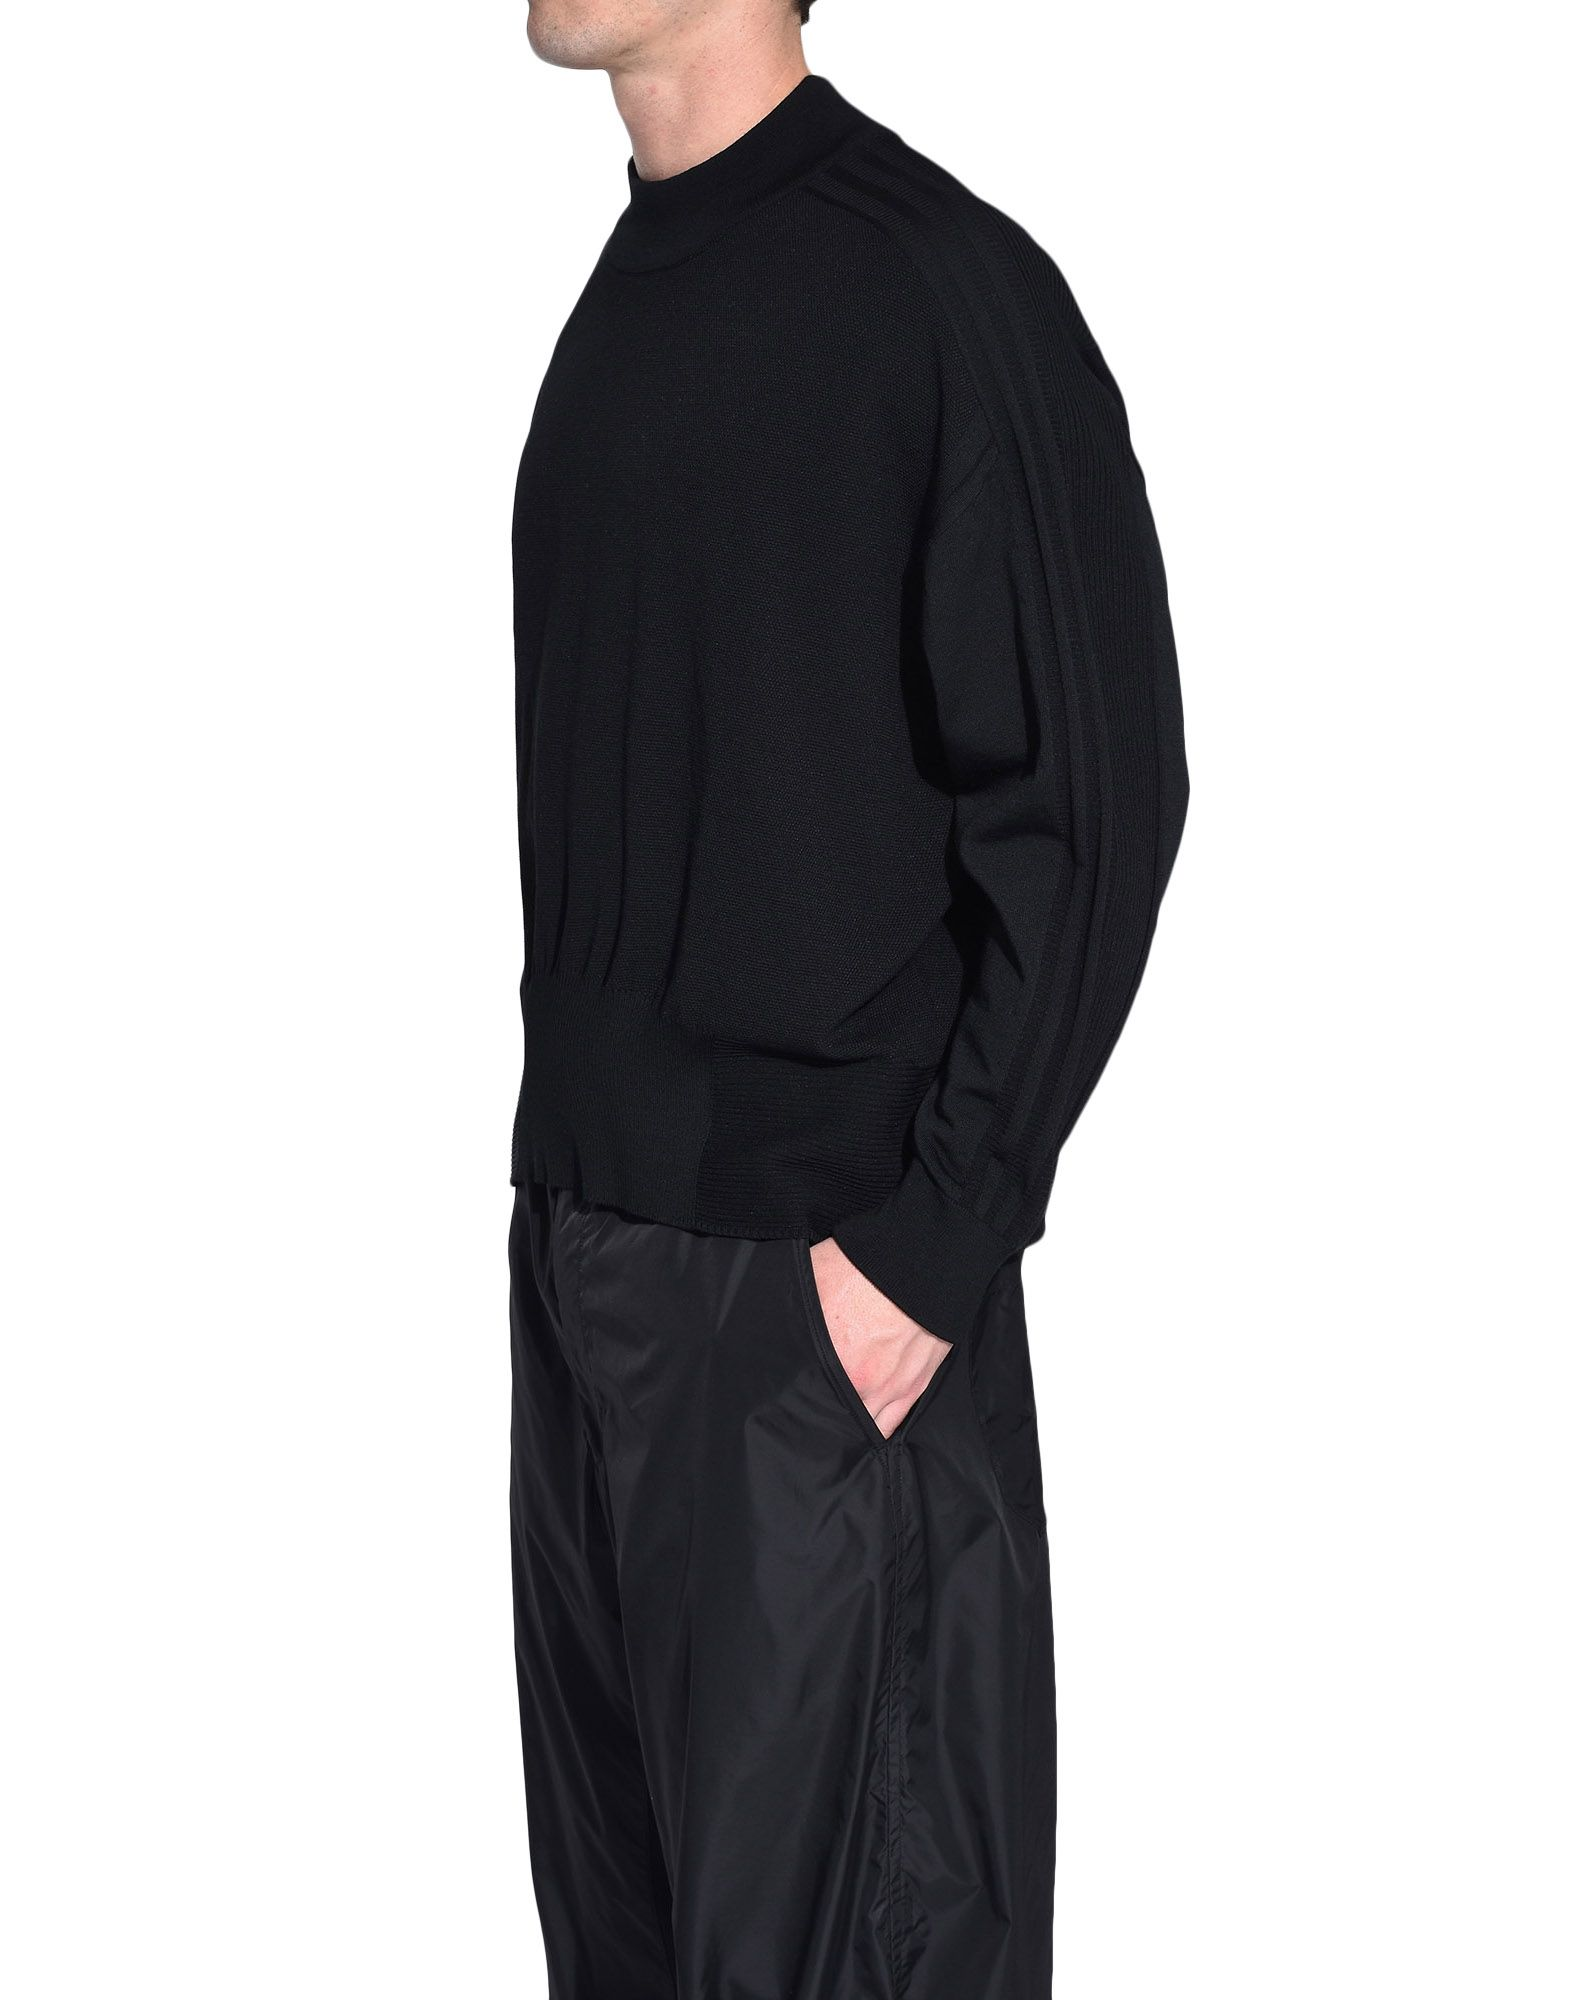 Y-3 Y-3 Tech Wool Sweater Langarmpulli Herren e